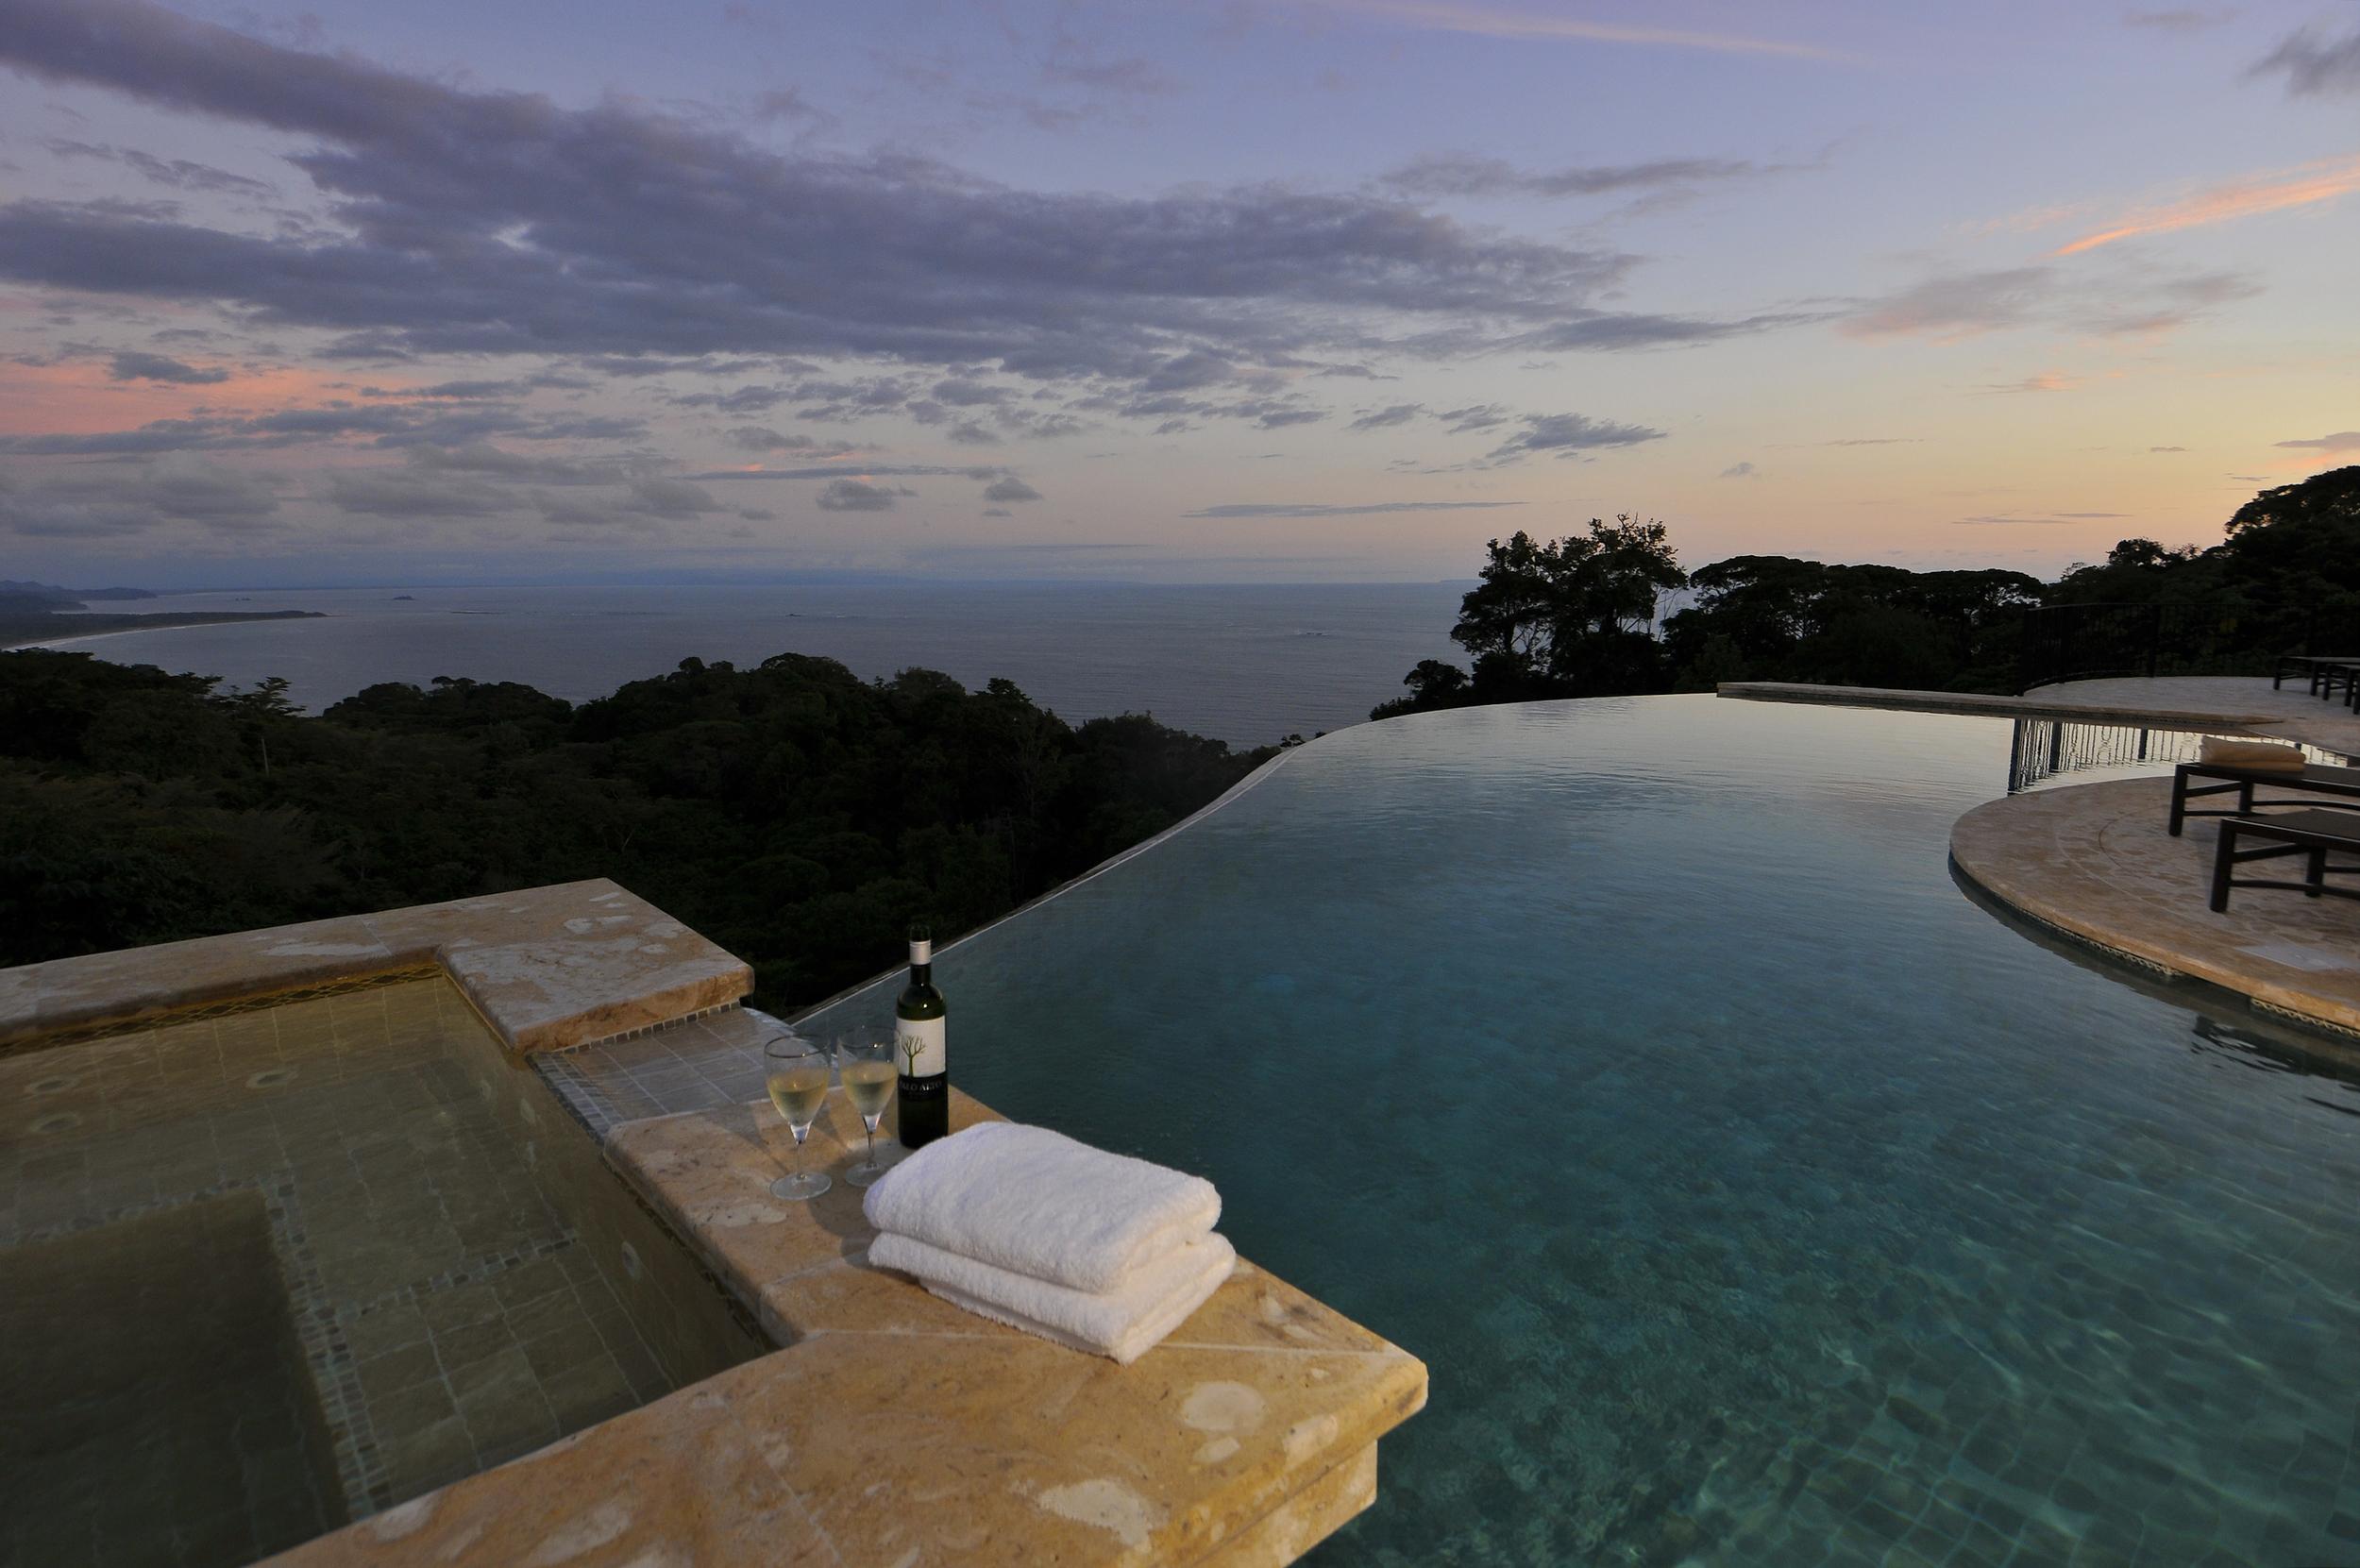 flex5-yoga-retreat-costa-rica-villa-infinity-pool-sunset-ocean-view.jpg